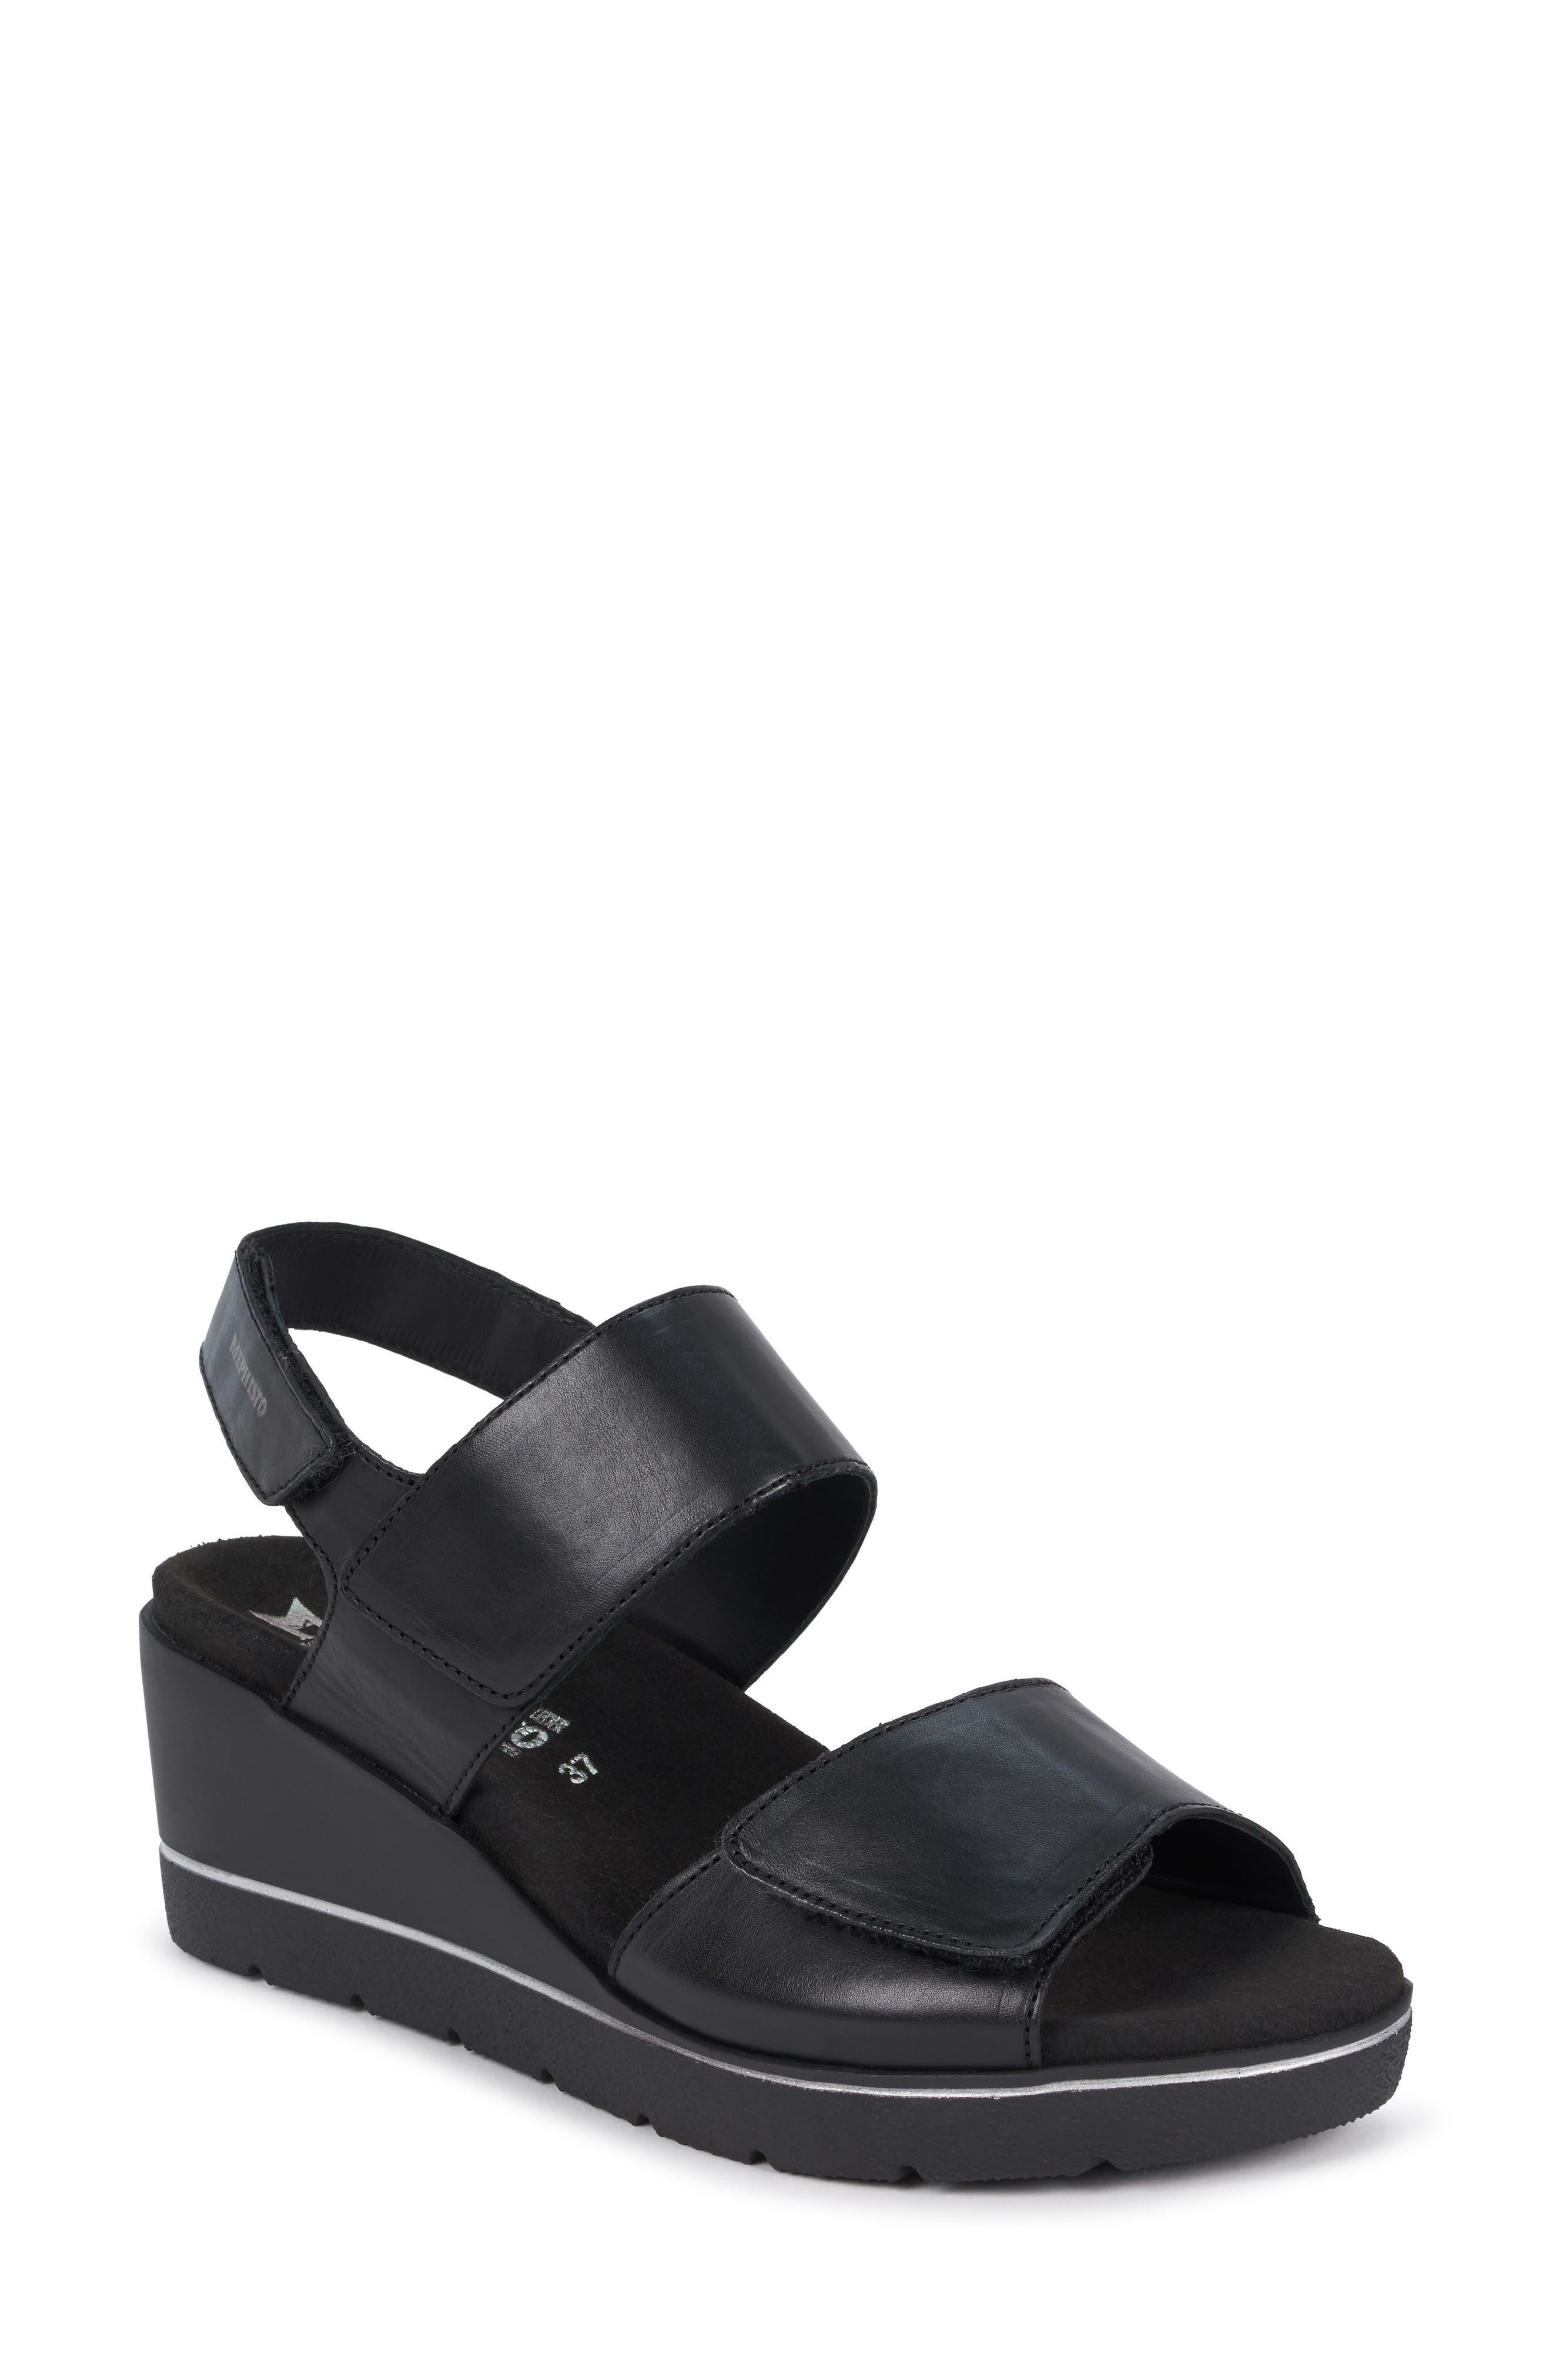 MEPHISTO Engelina Wedge Sandal, Main, color, BLACK SILK LEATHER